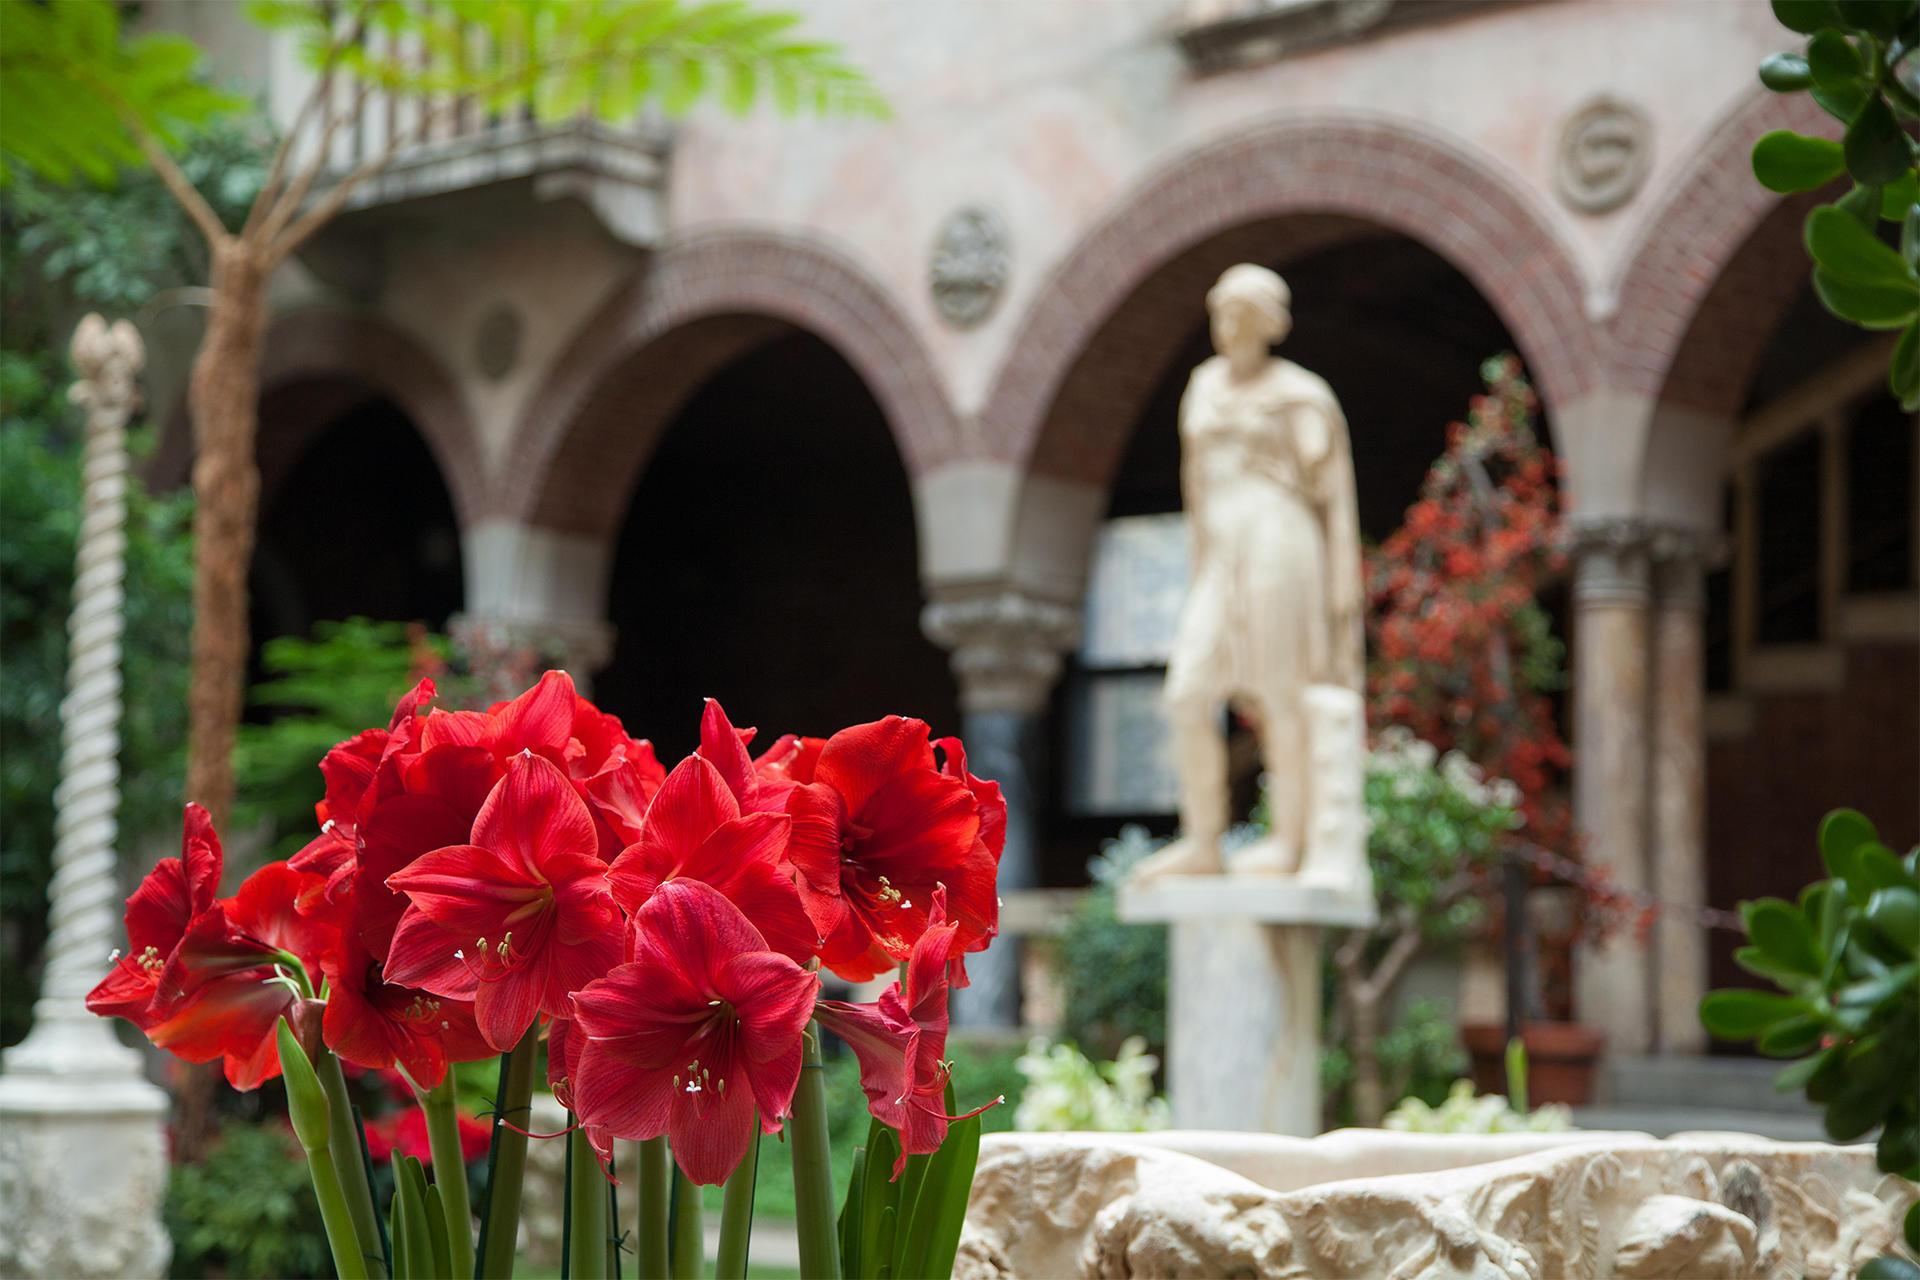 Red Amaryllis in the holiday garden courtyard at the Isabella Stewart Gardner Museum.